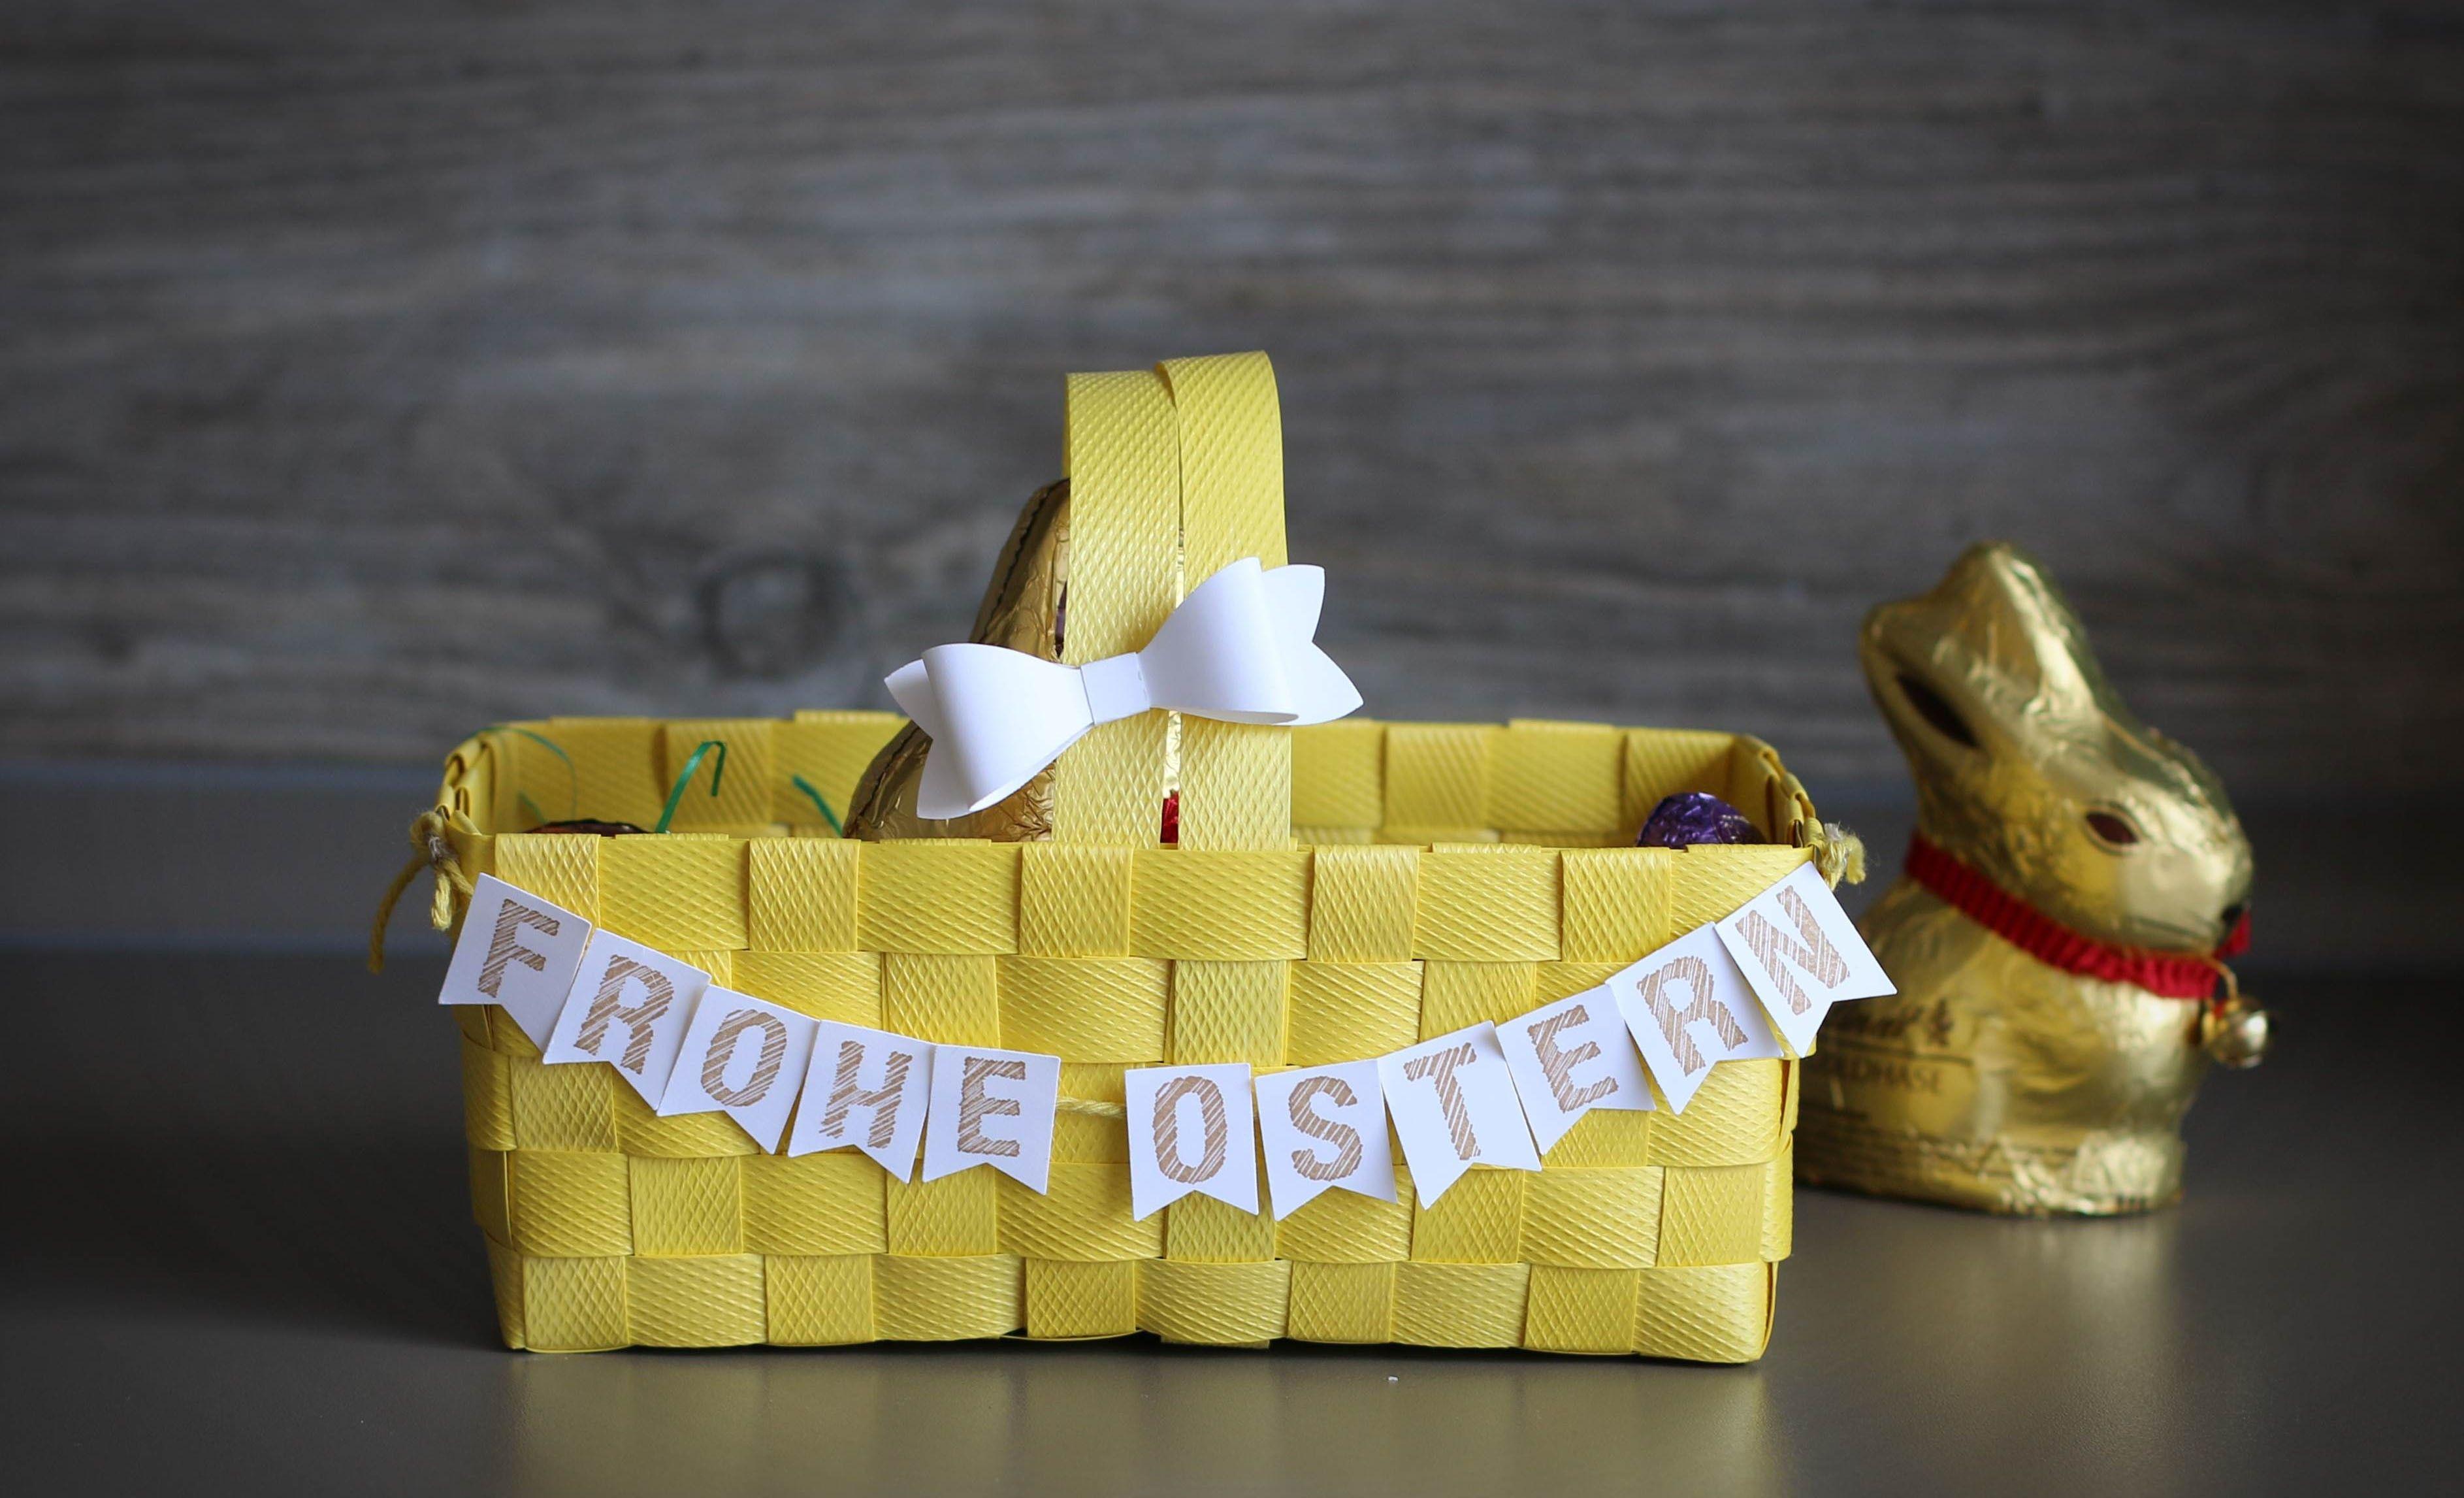 deko ideen zu ostern einen sch nen osterkorb kann jeder selber basteln. Black Bedroom Furniture Sets. Home Design Ideas